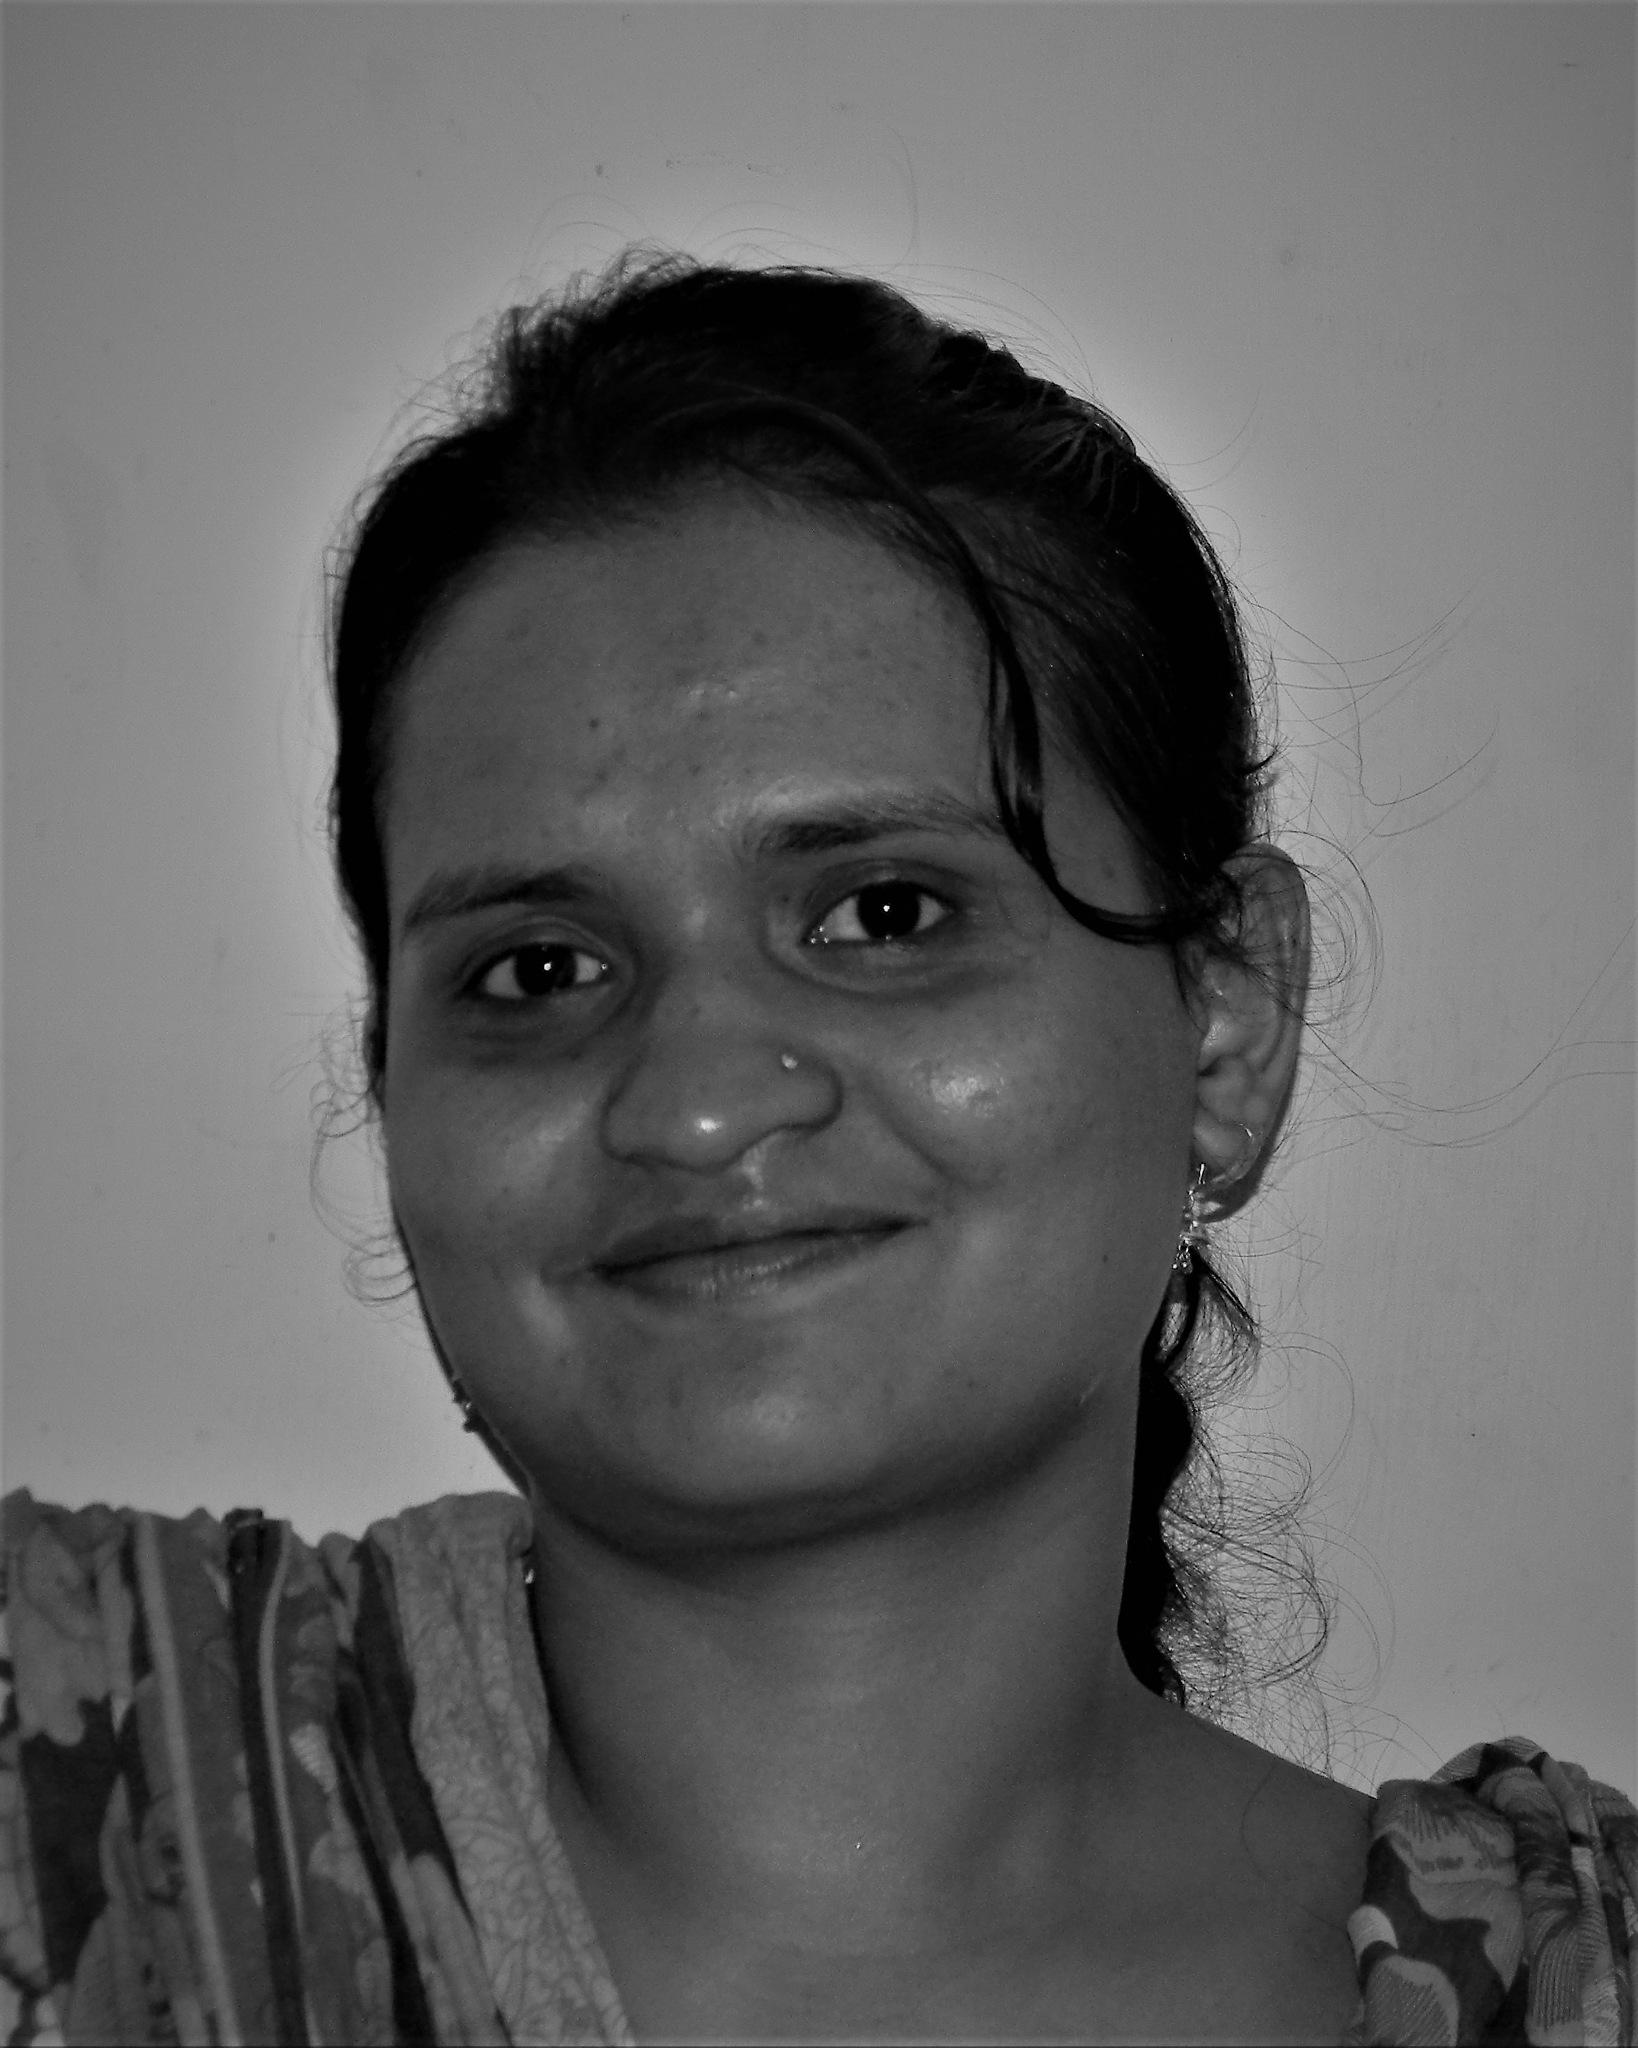 Happy girl in Bangladesh  by A.K.M. Ali hossain